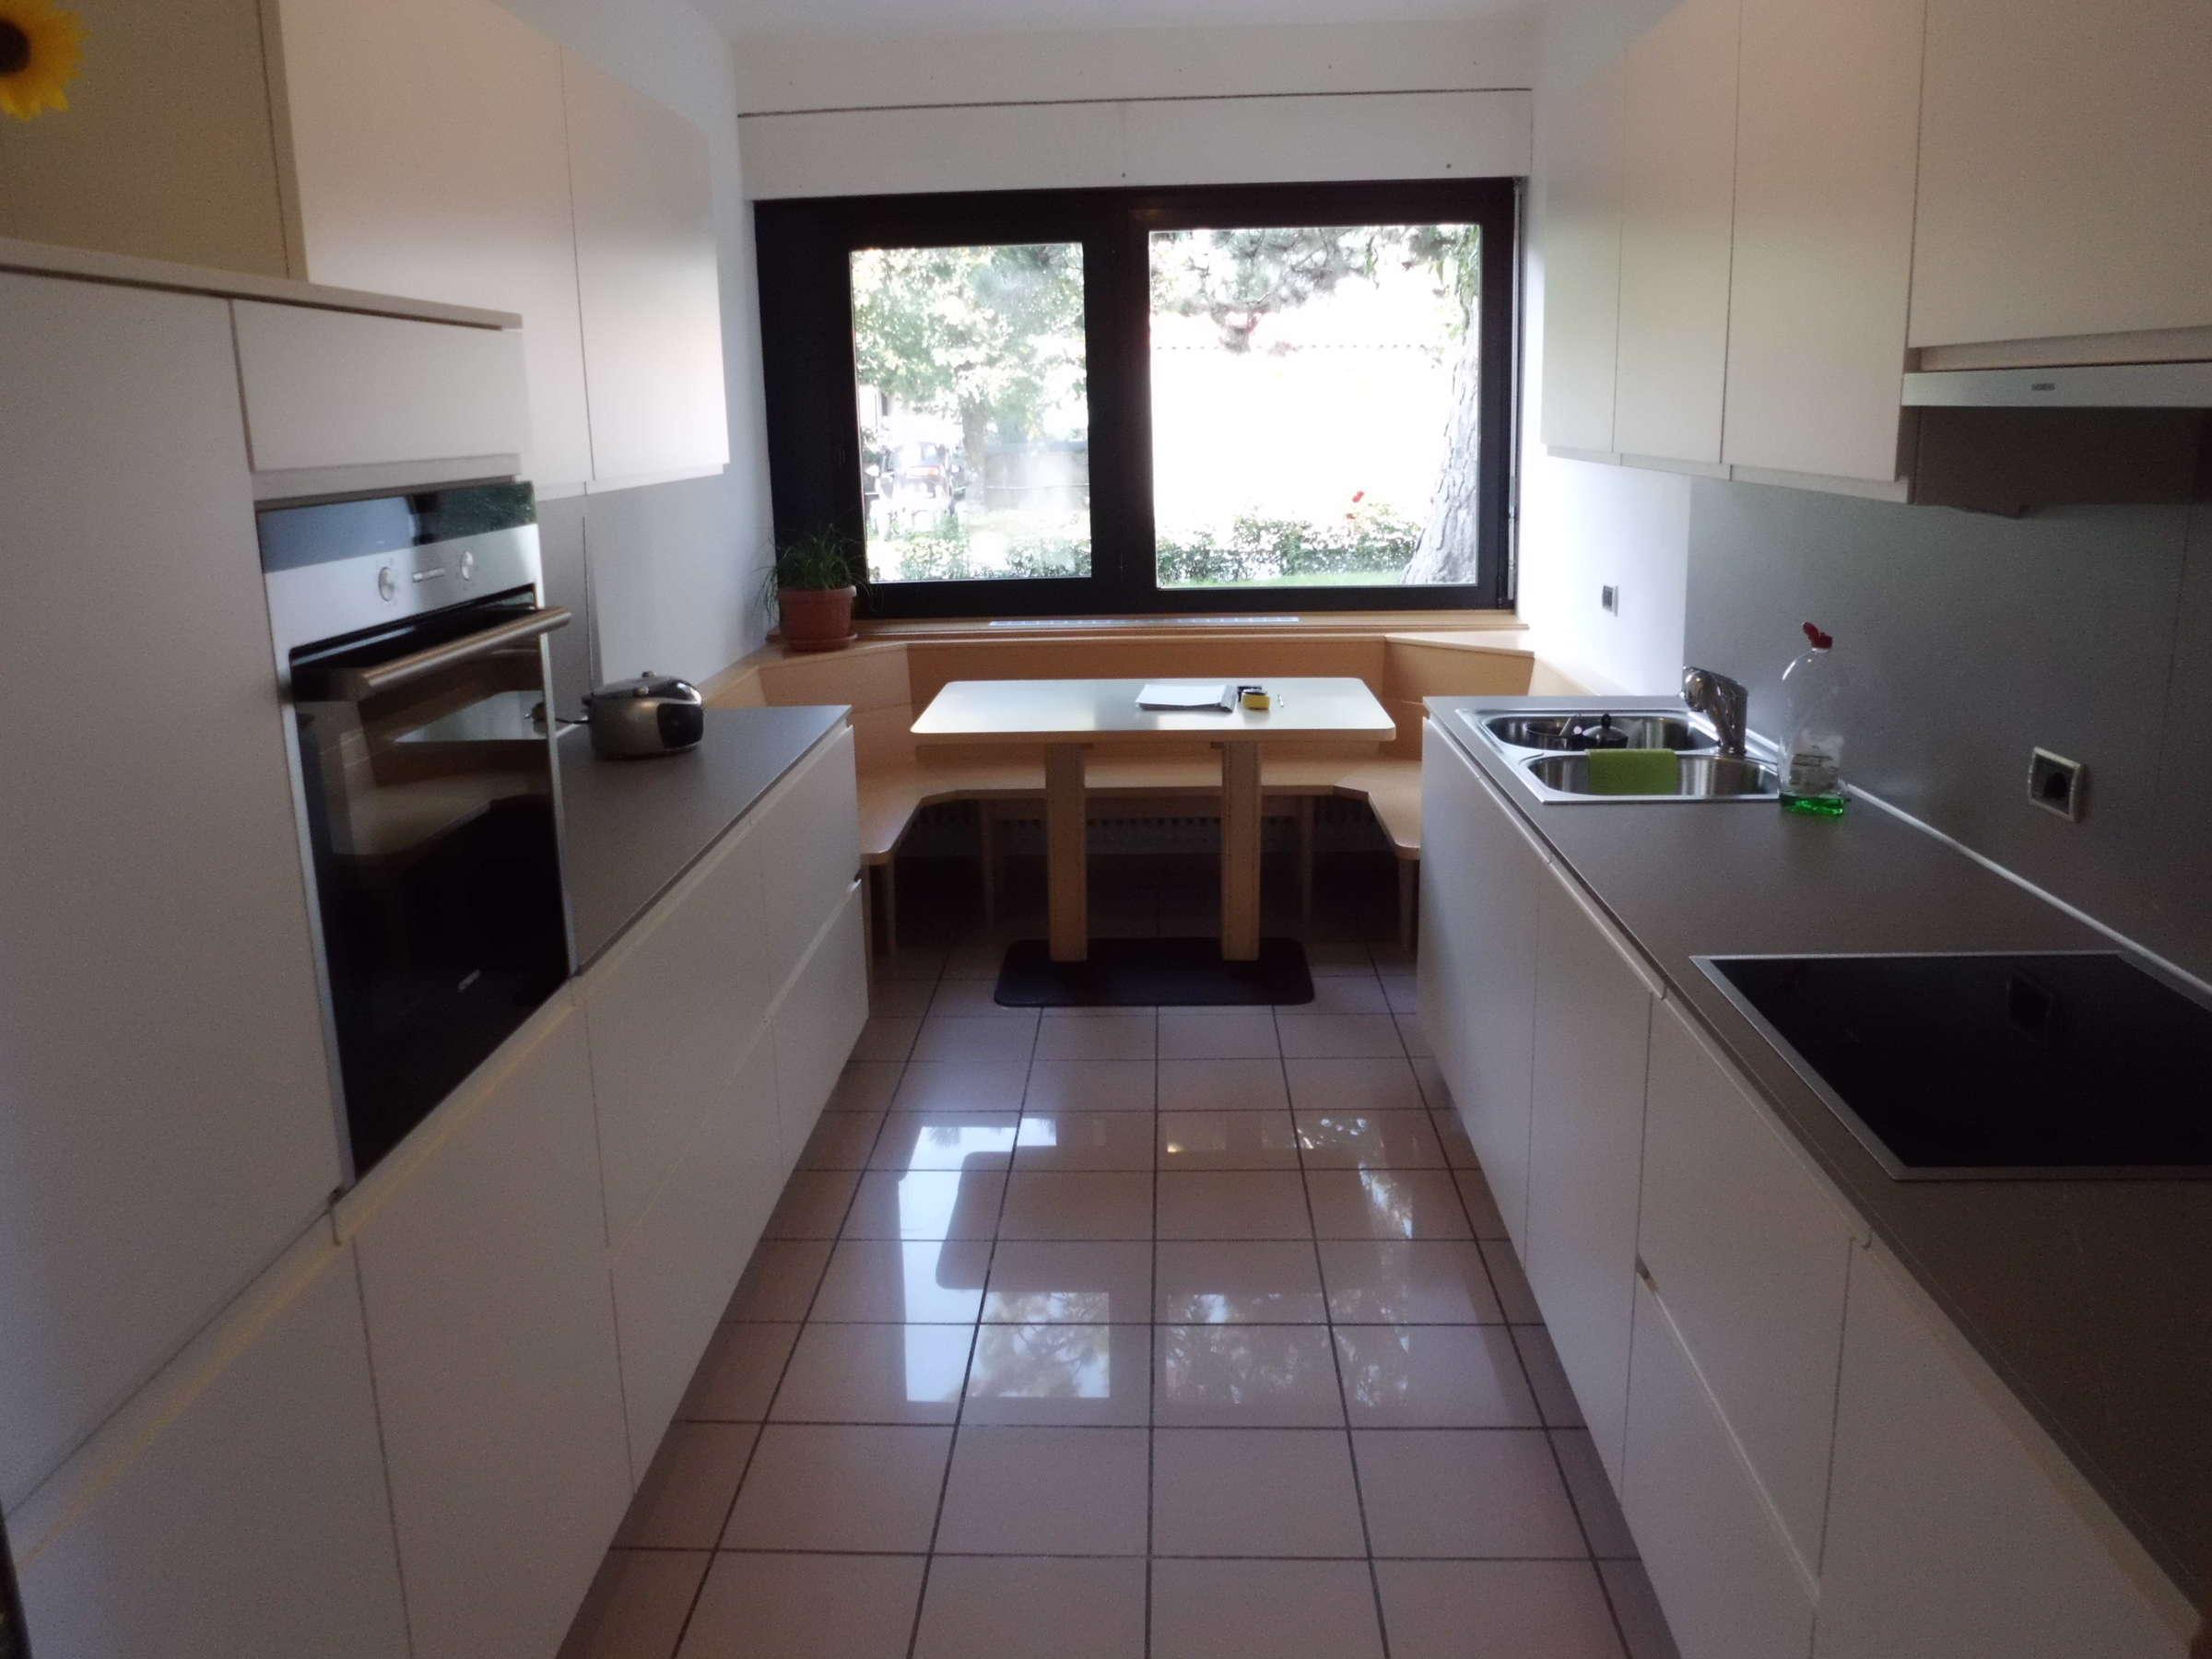 Erfreut Küchenboden Fliesenreiniger Bilder - Küche Set Ideen ...